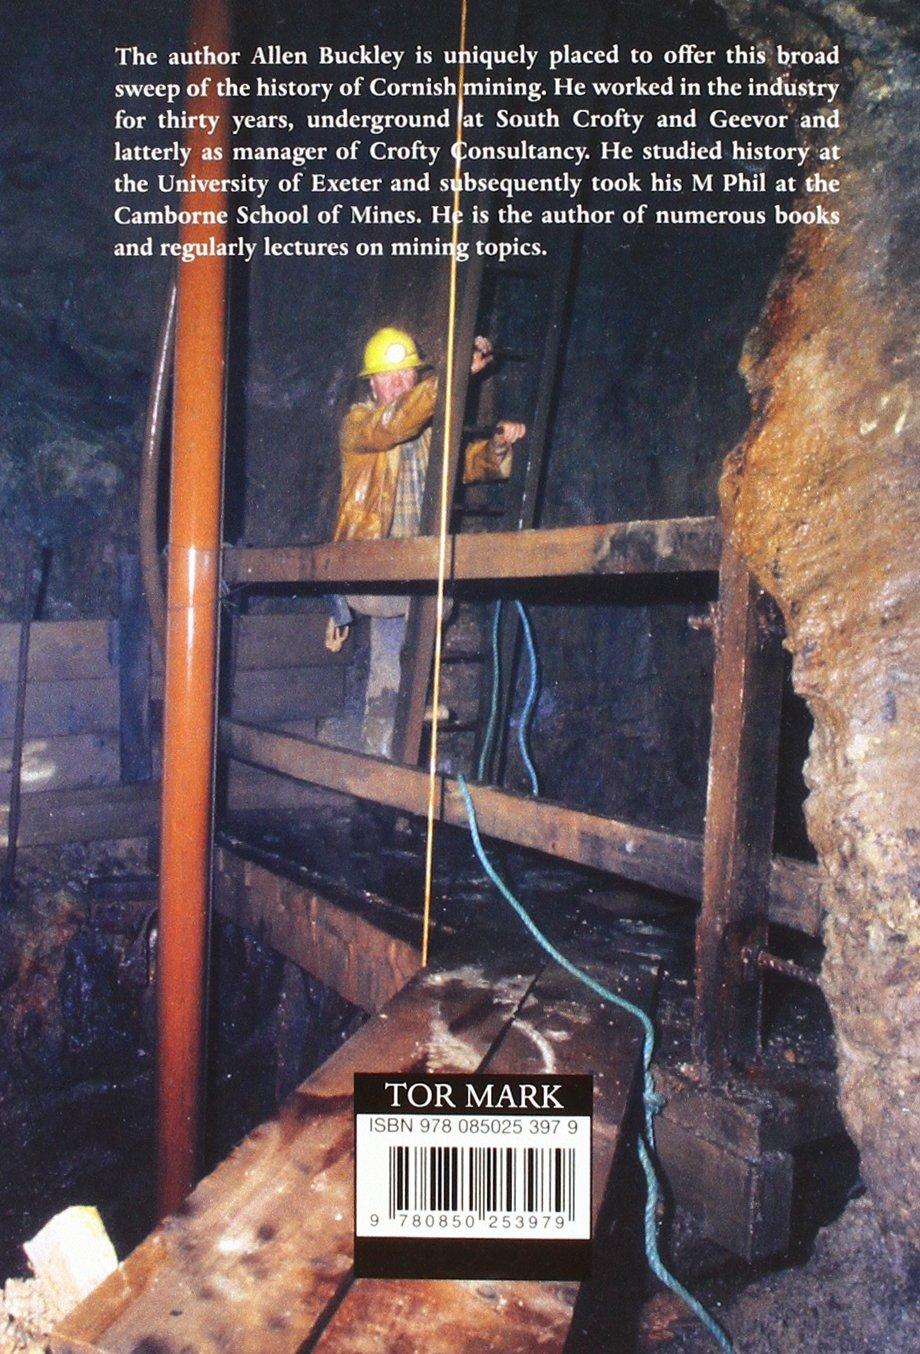 Cornish Mineral Production